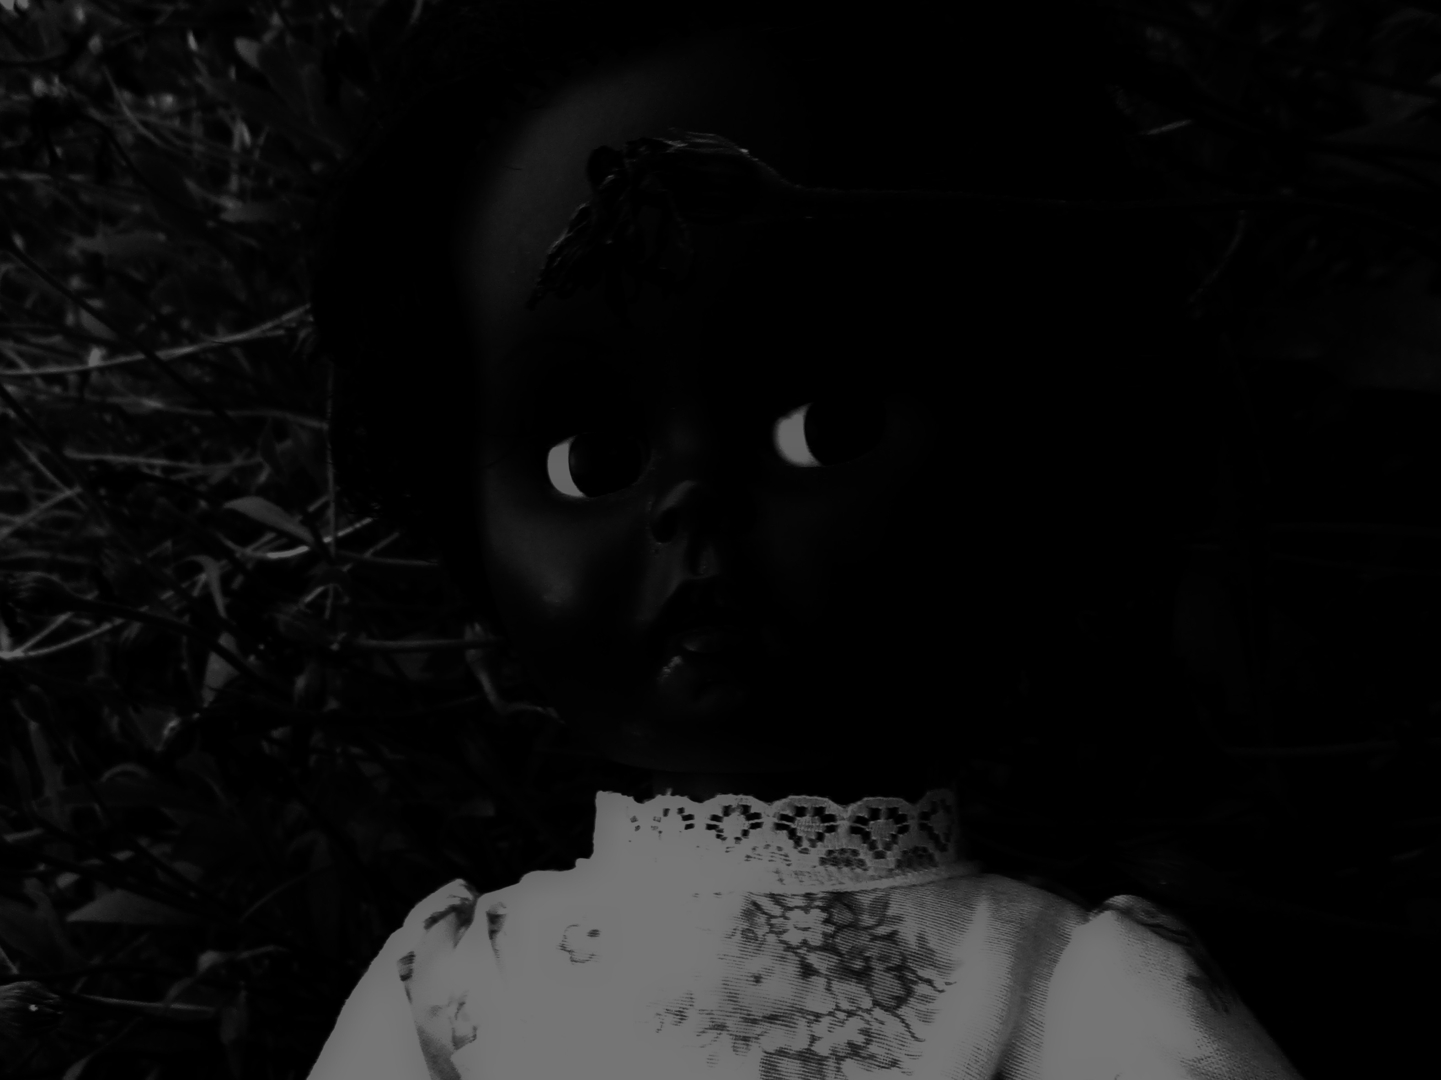 doll 2 image